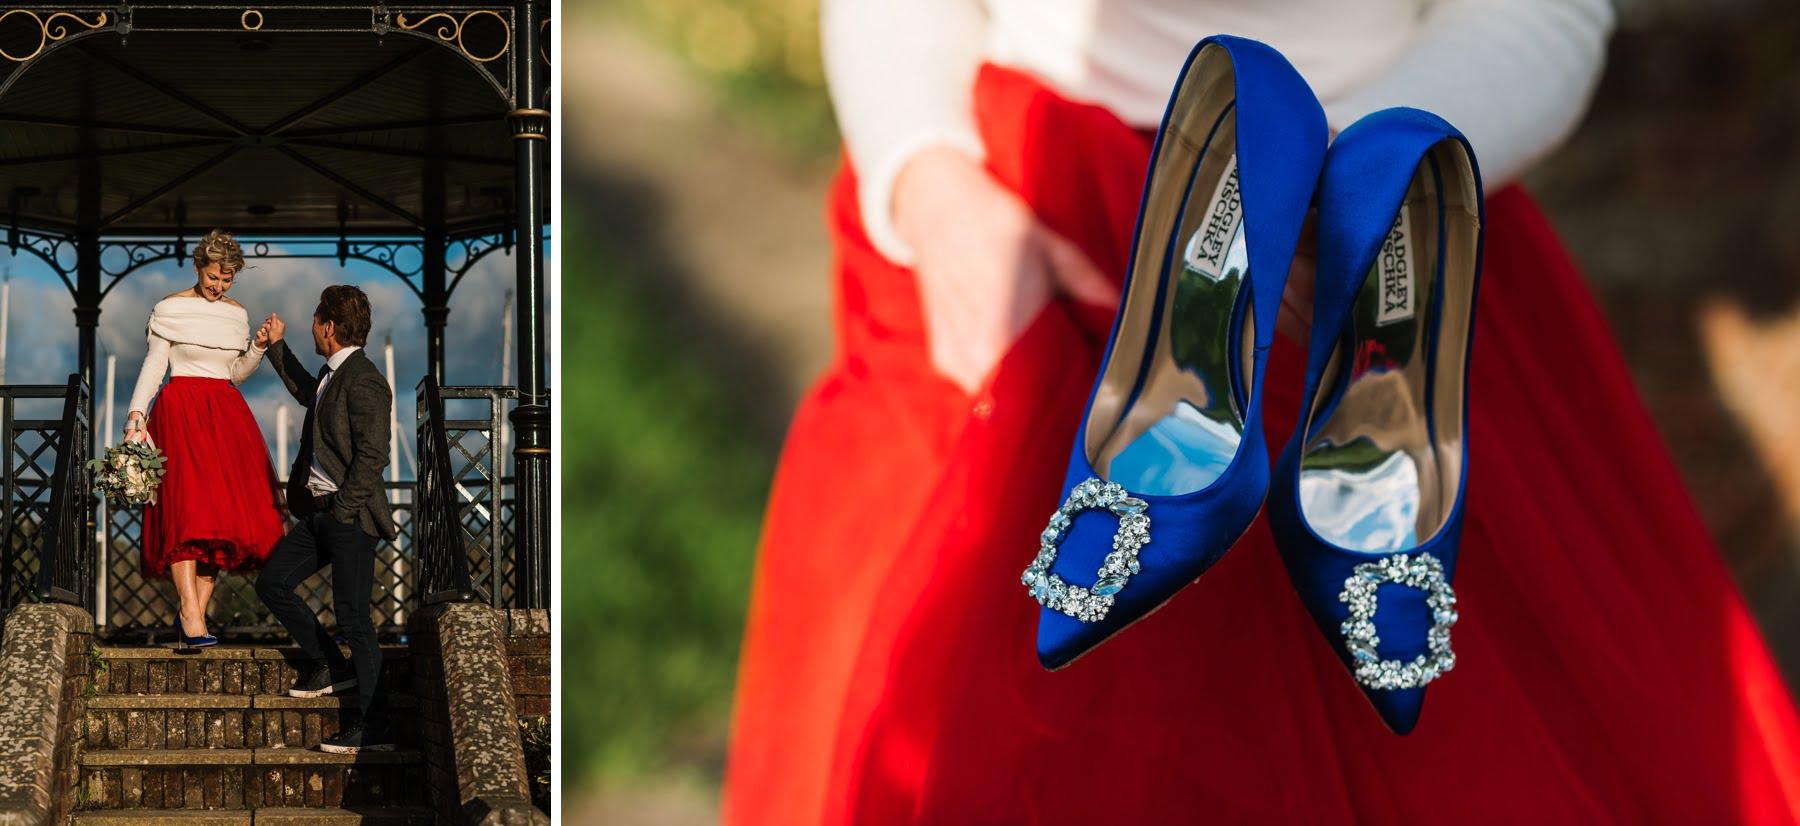 Blue Bridal Shoes similar to Manolo Blahnik